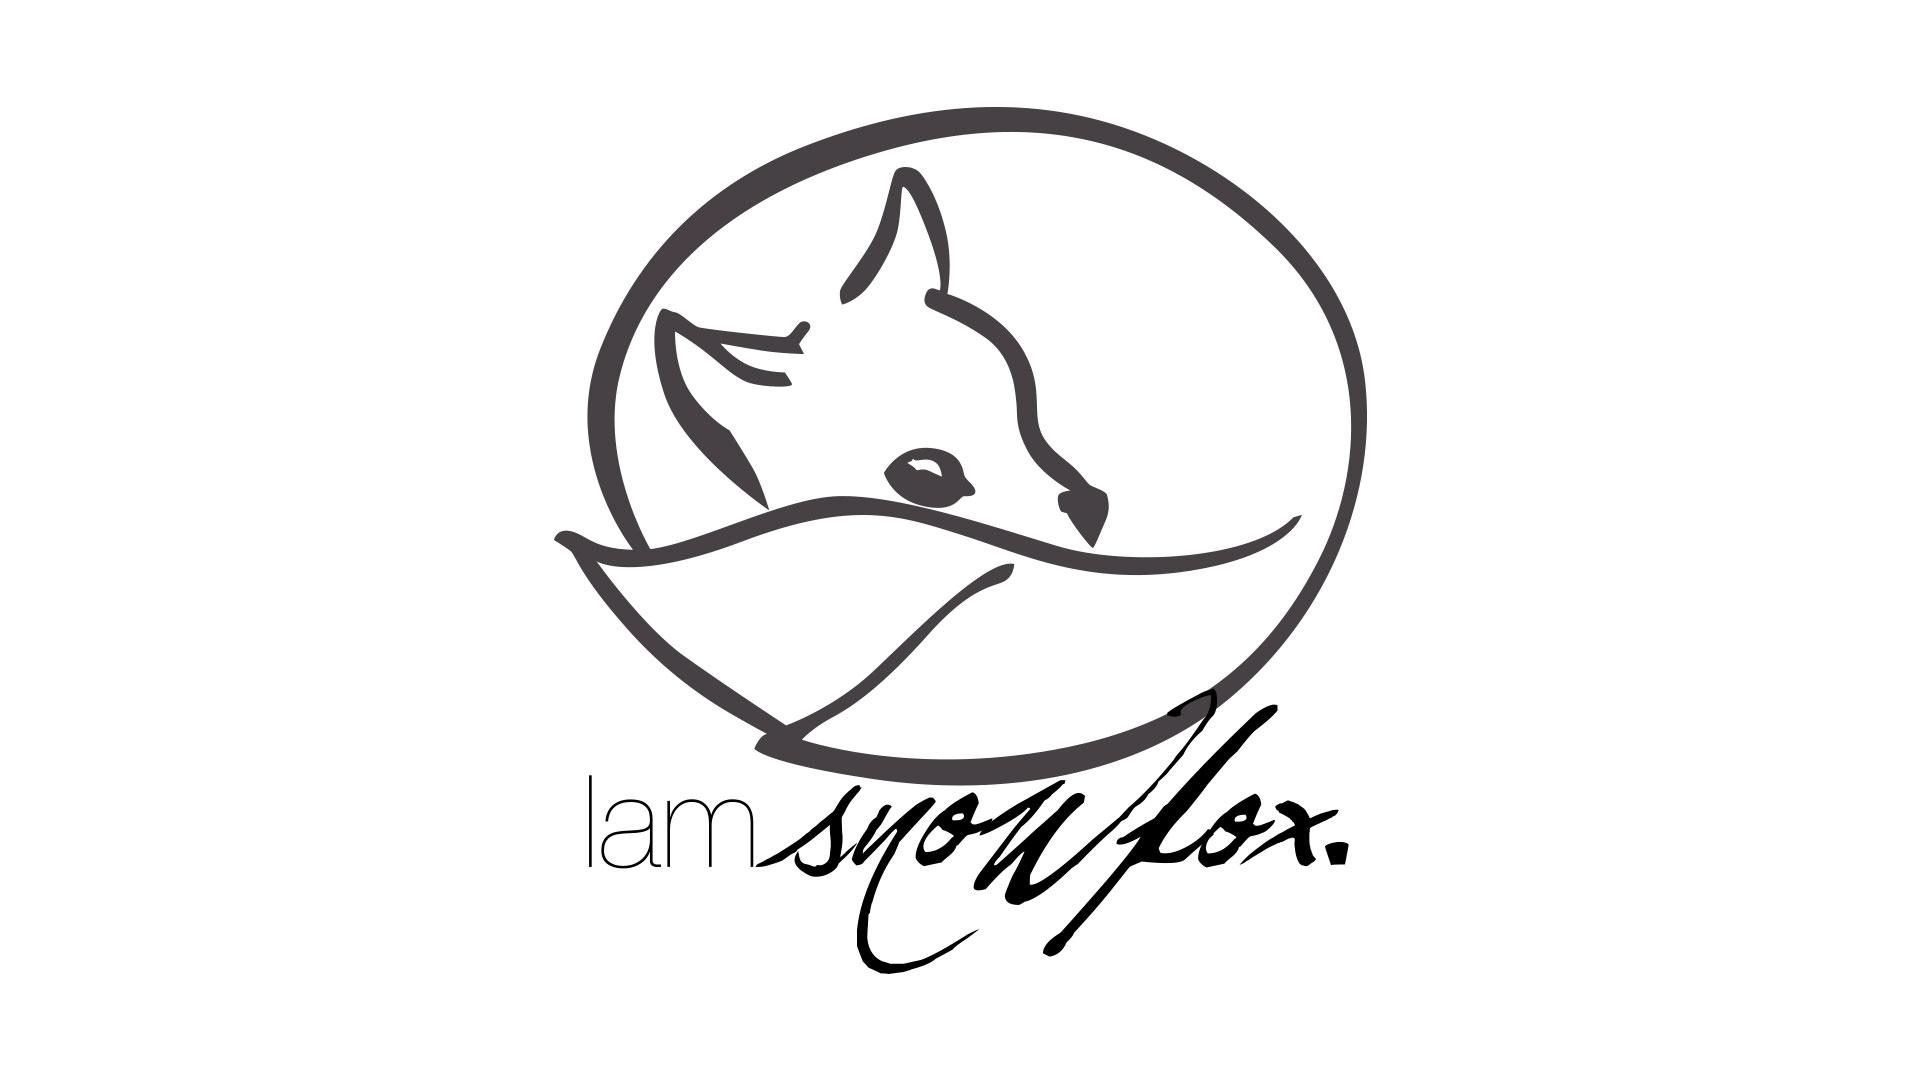 IamSnowfox. logo